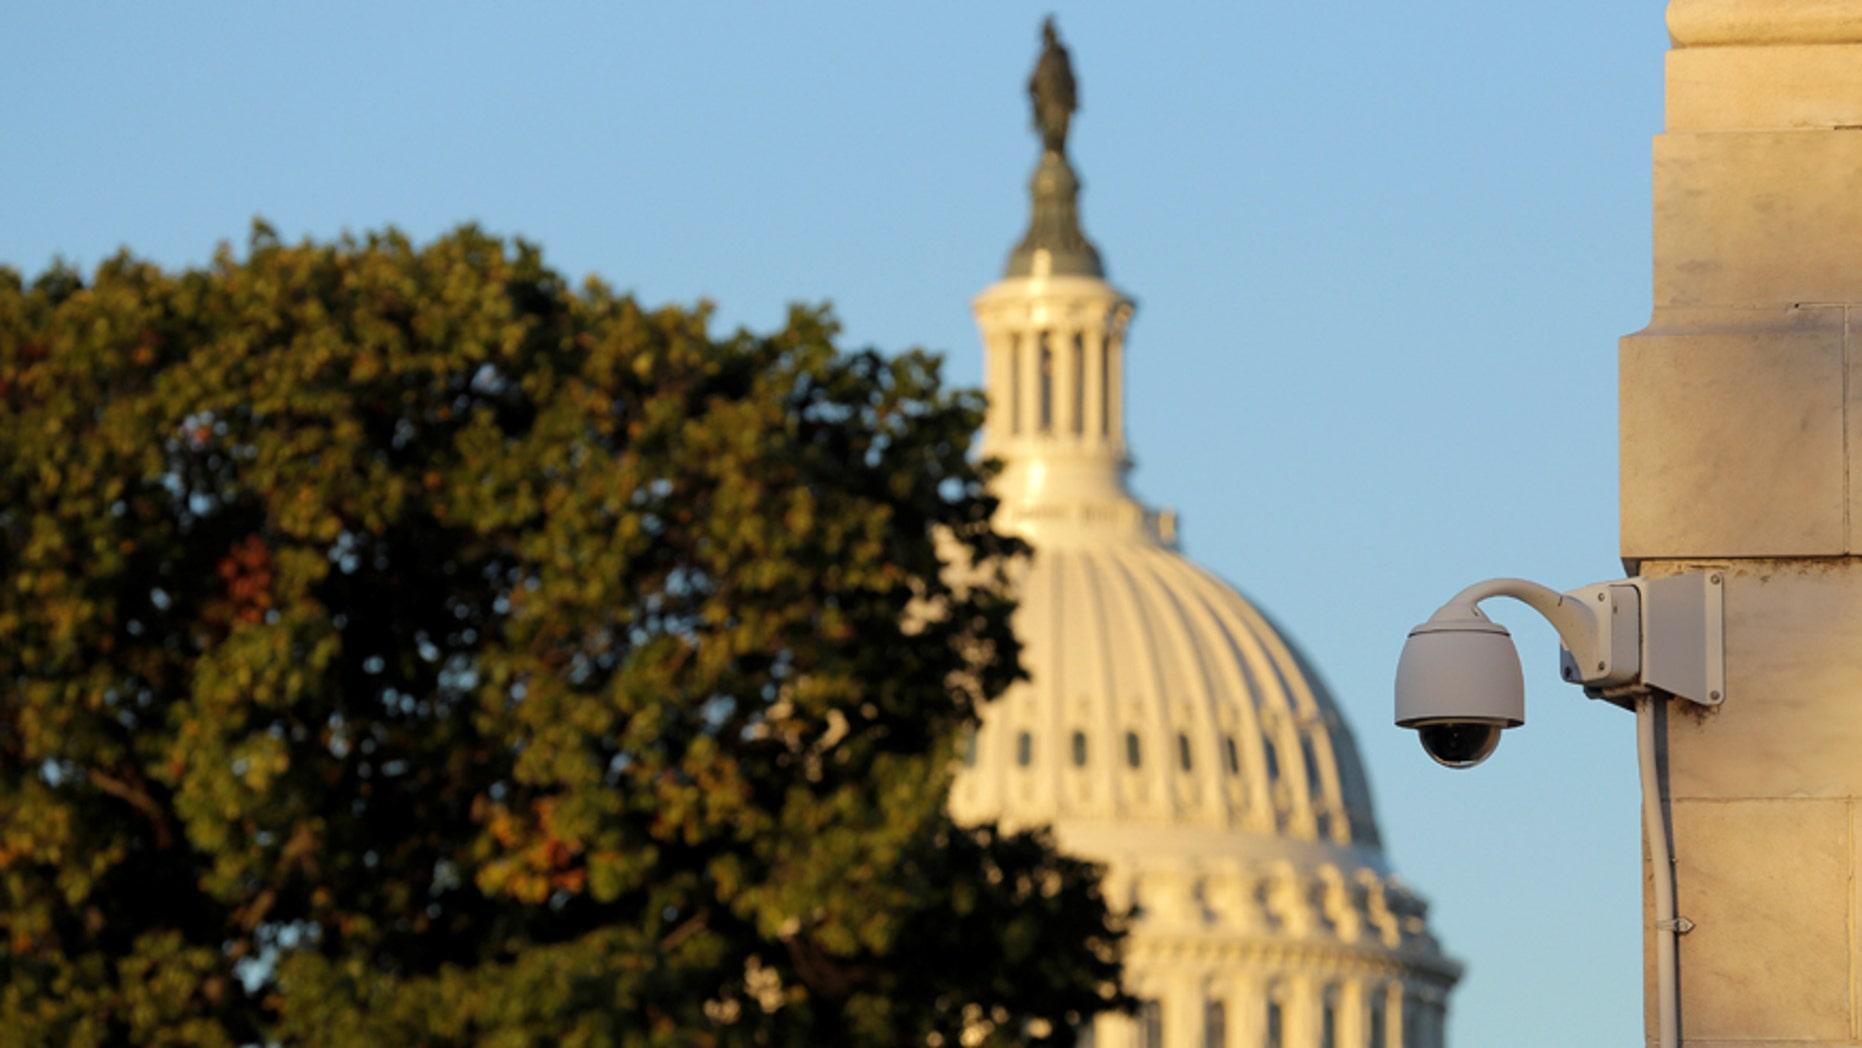 A security camera hangs near the U.S. Capitol in Washington, U.S., Nov. 7, 2016. (REUTERS/Joshua Roberts)